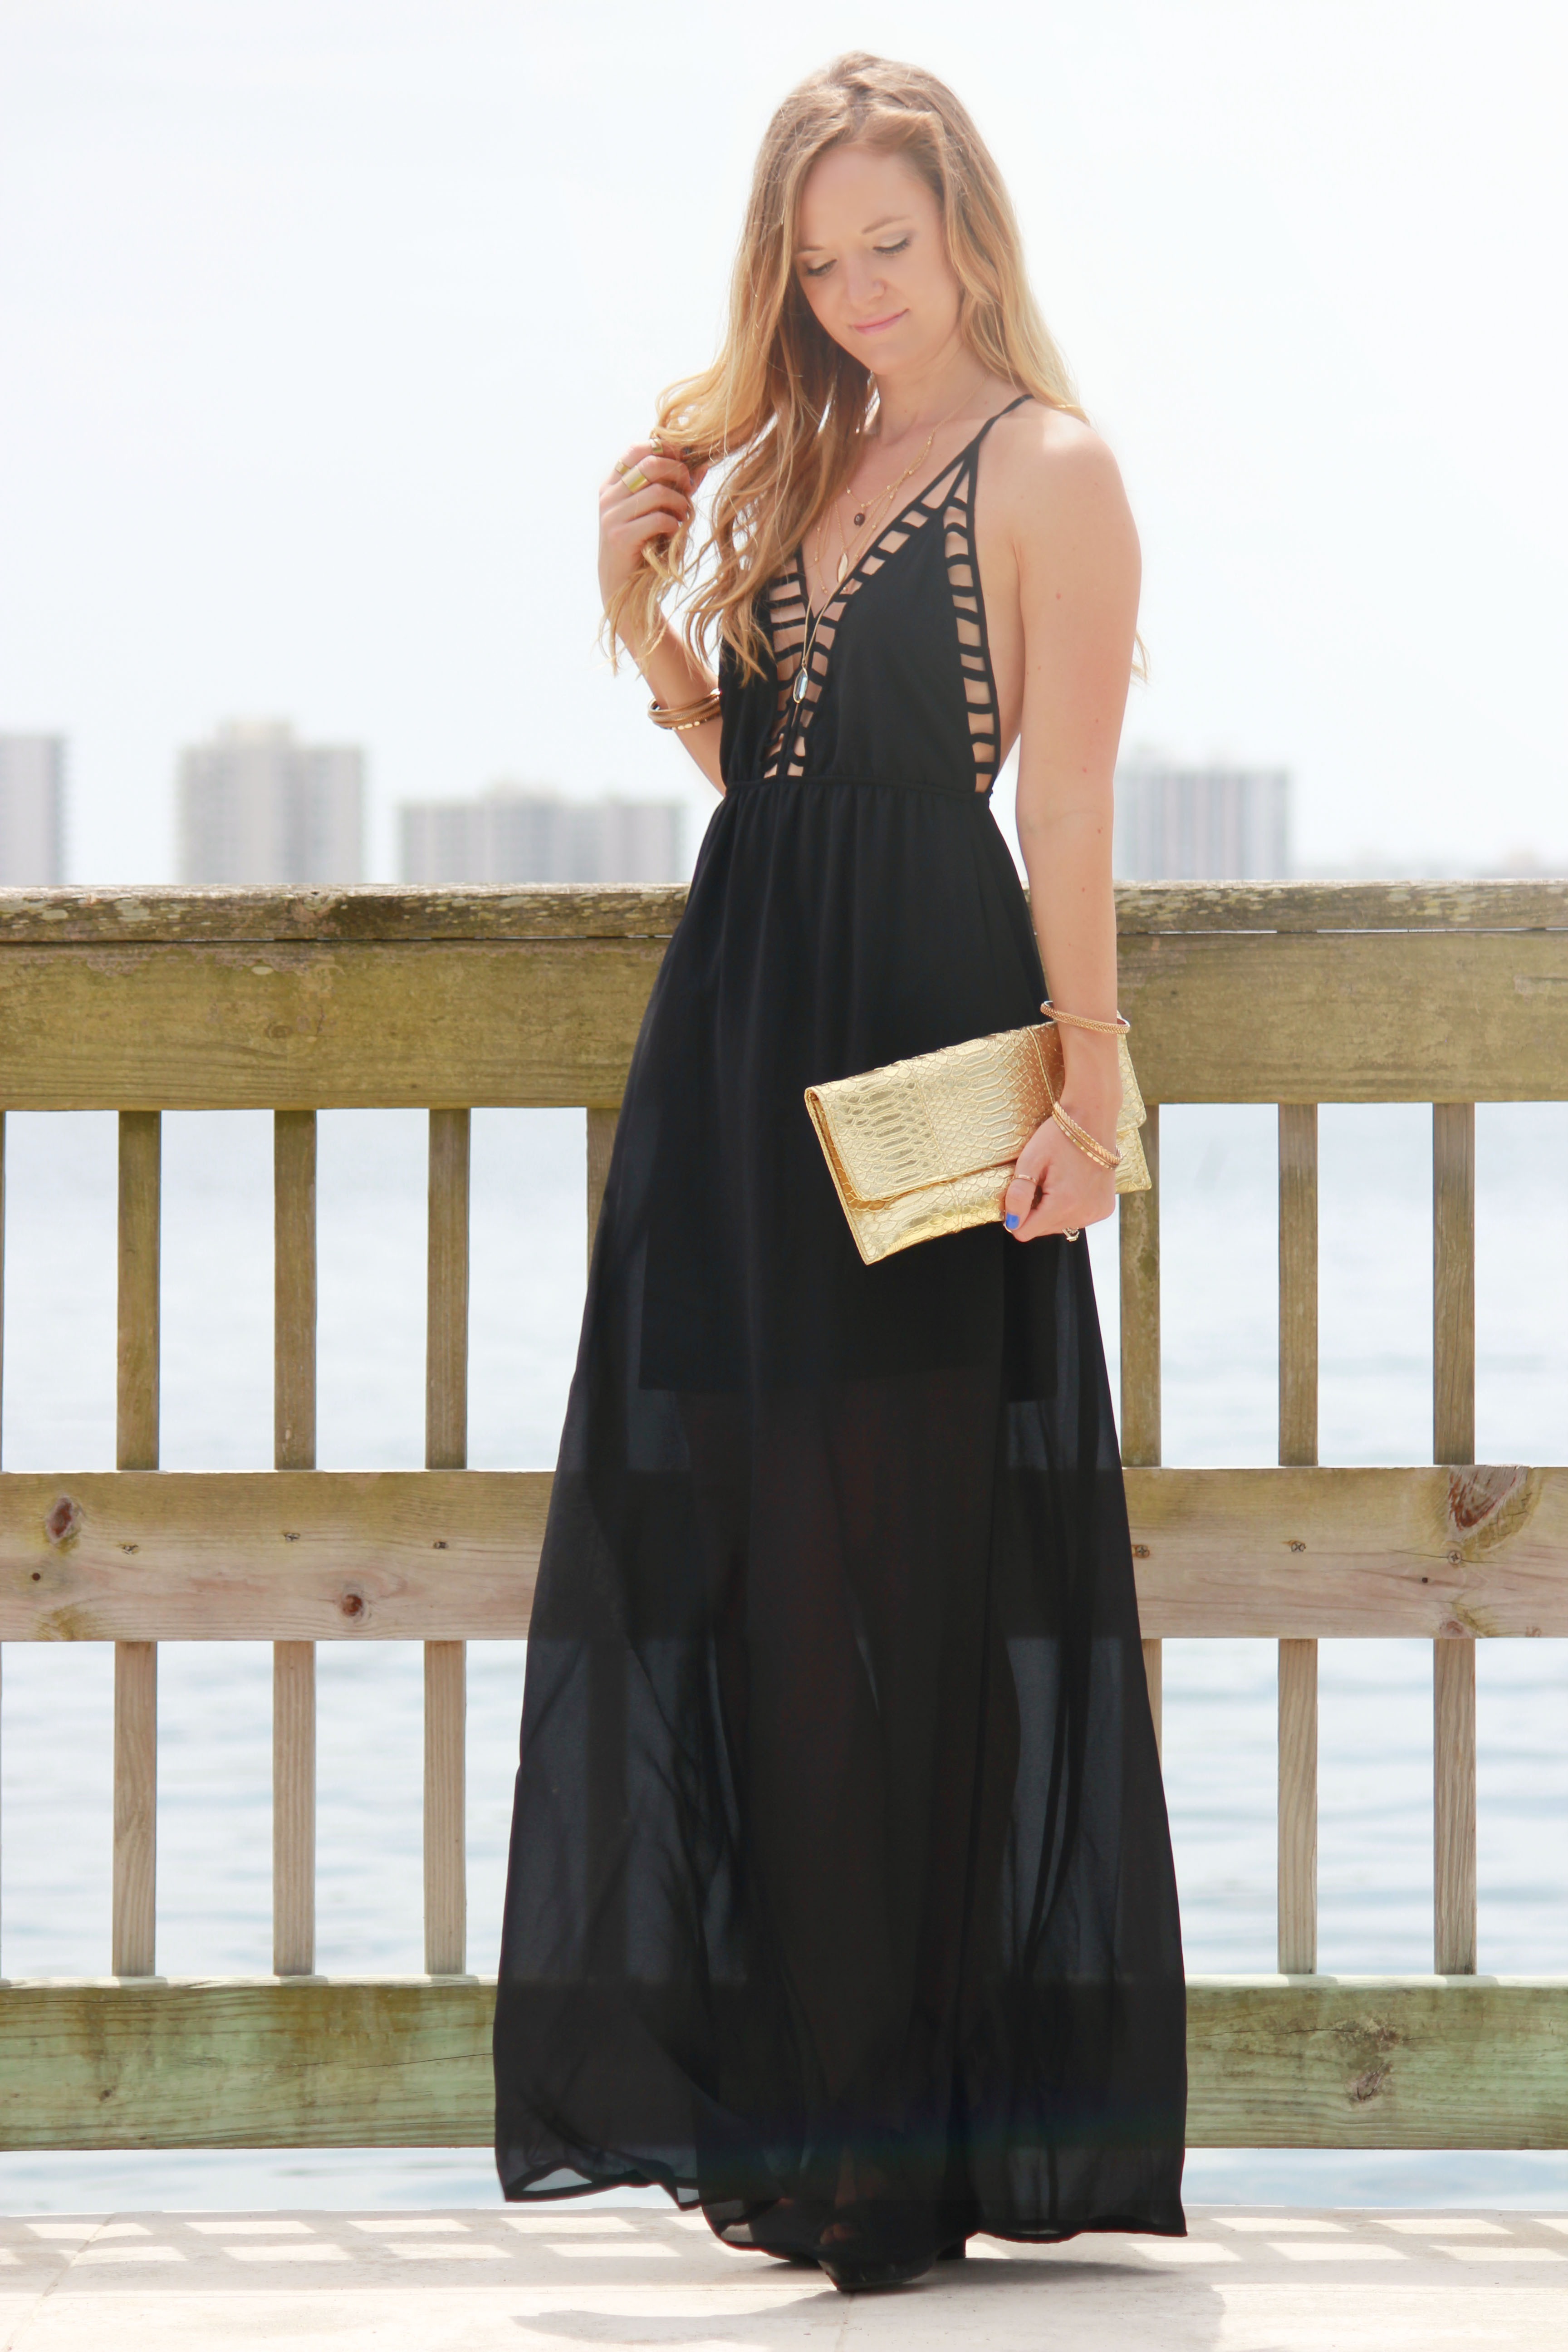 monicas closet essentials maxi dress, black maxi dress, express necklace, layred necklace, gold clutch, summer outfit, summer maxi